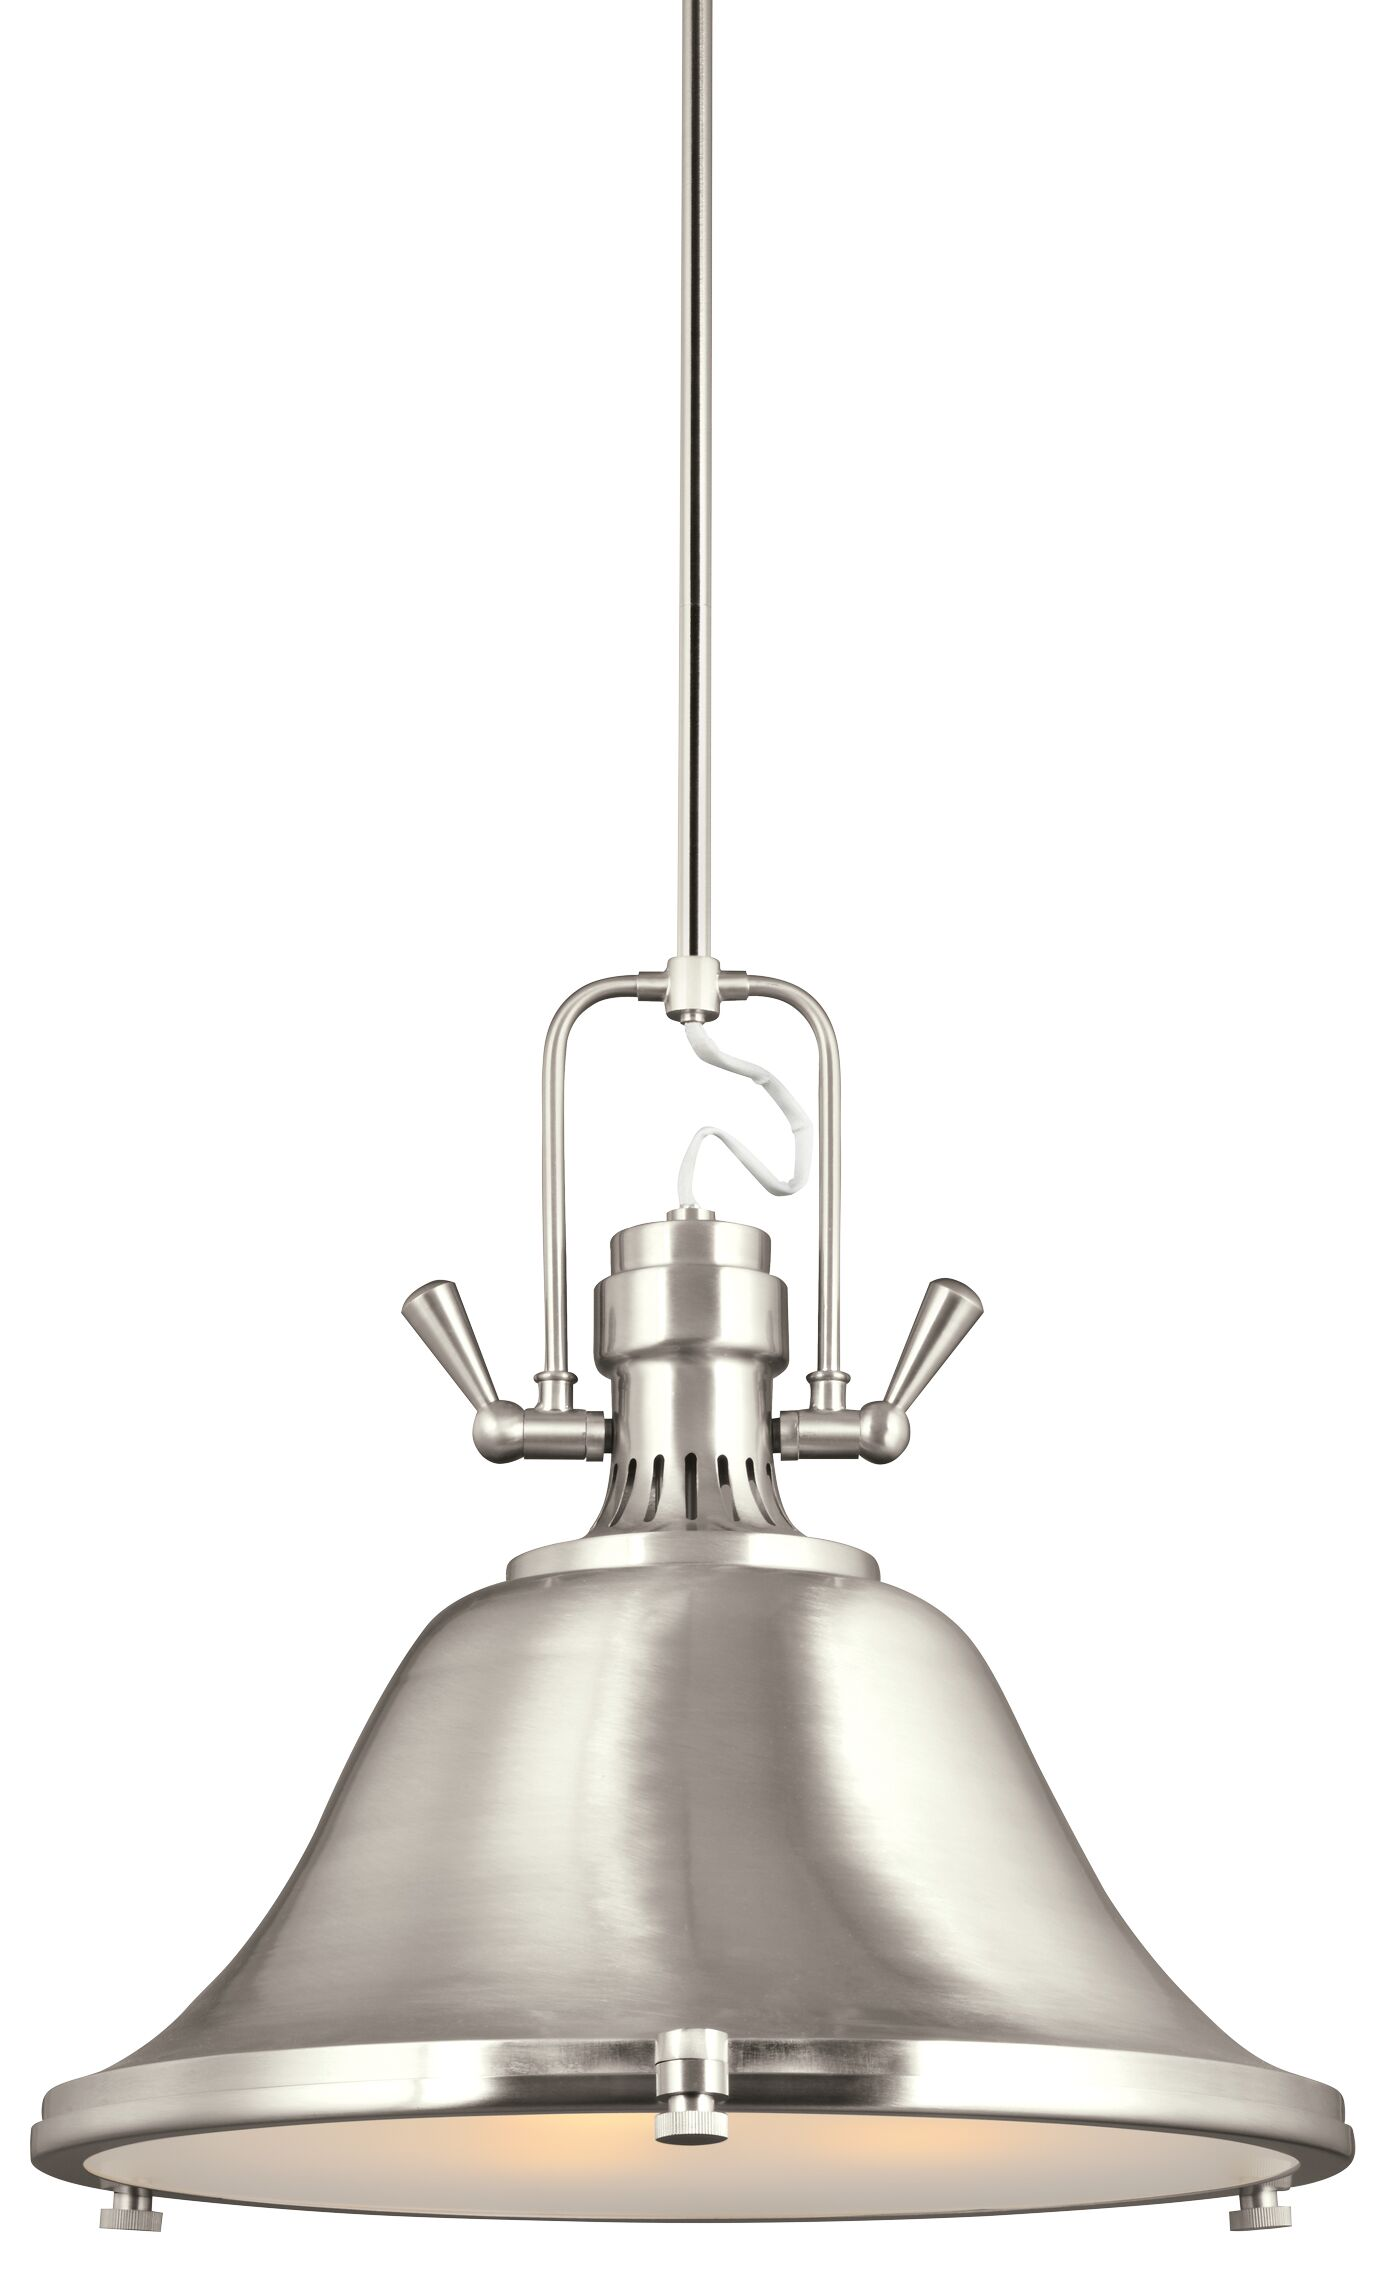 Chiaramonte 3-Light Cone Pendant Finish: Brushed Nickel